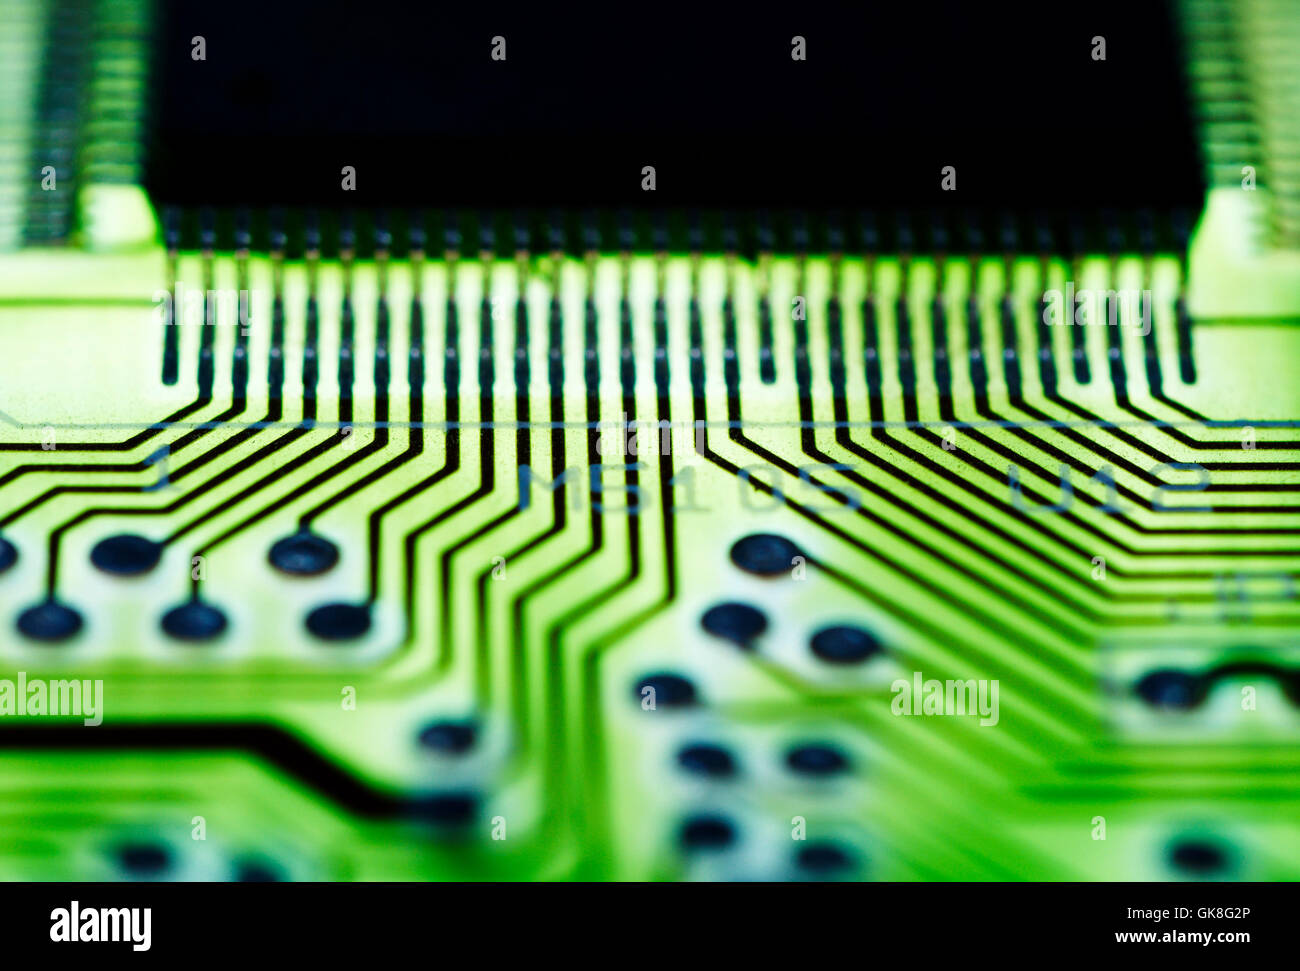 Printed Circuit Card Miniature Stock Photos Pcb 3 Image